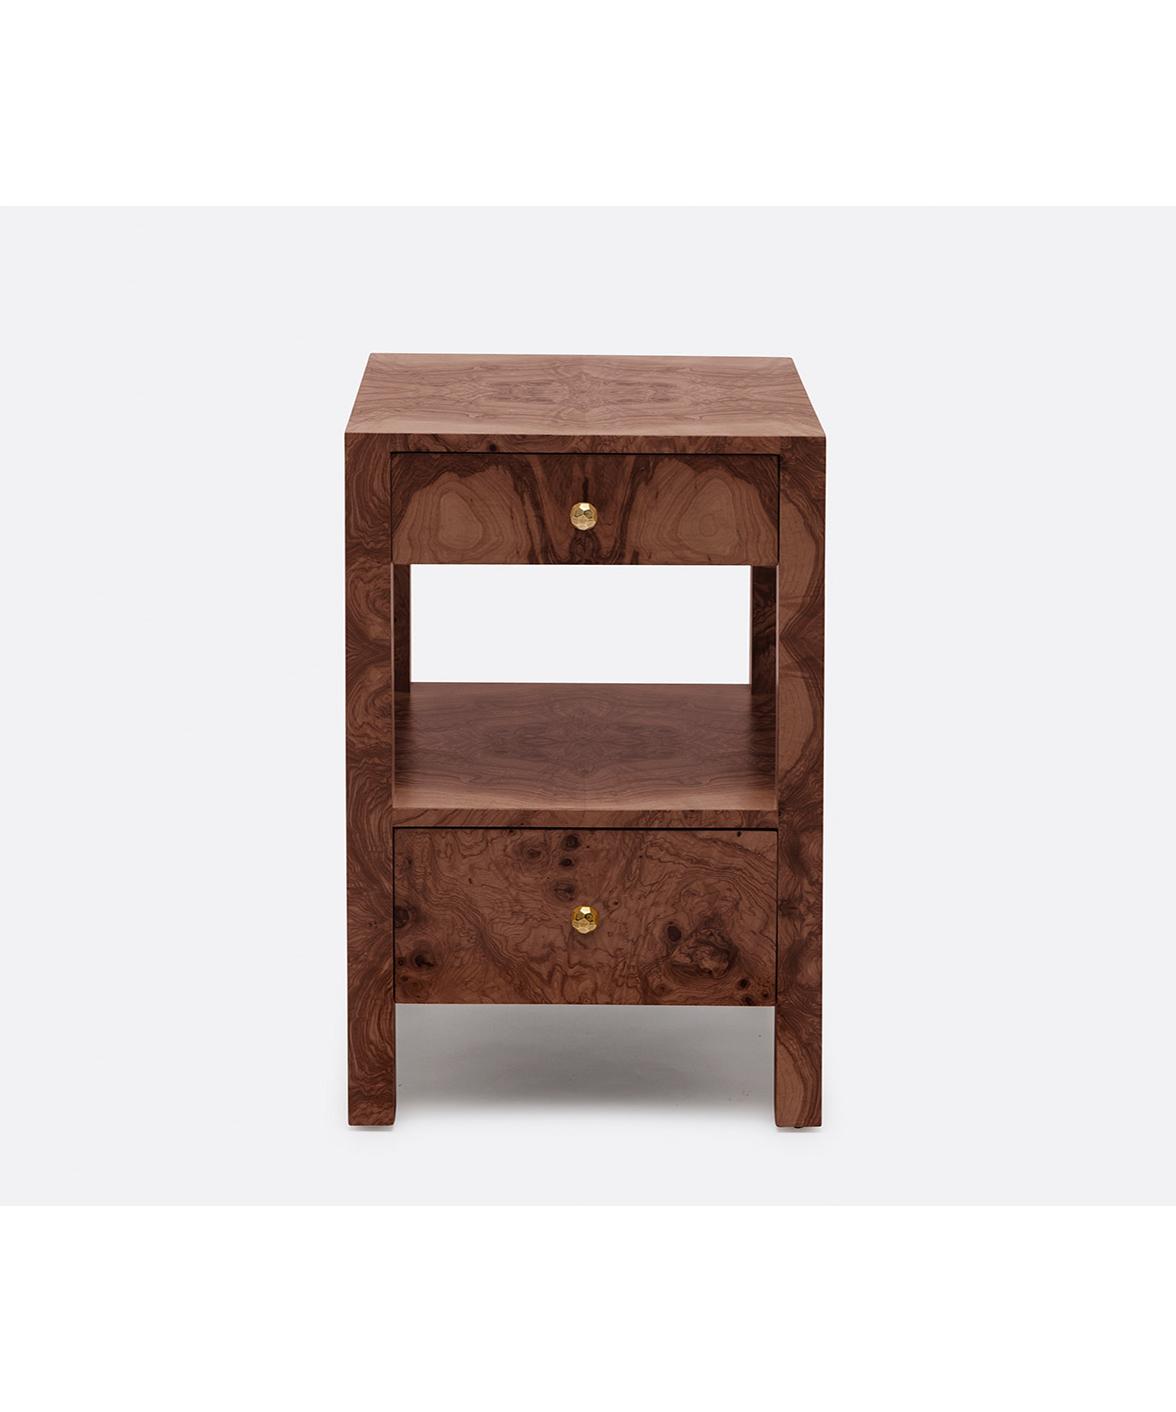 Bedside Tables  Oak Bedside Cabinets amp Narrow Drawers  MampS